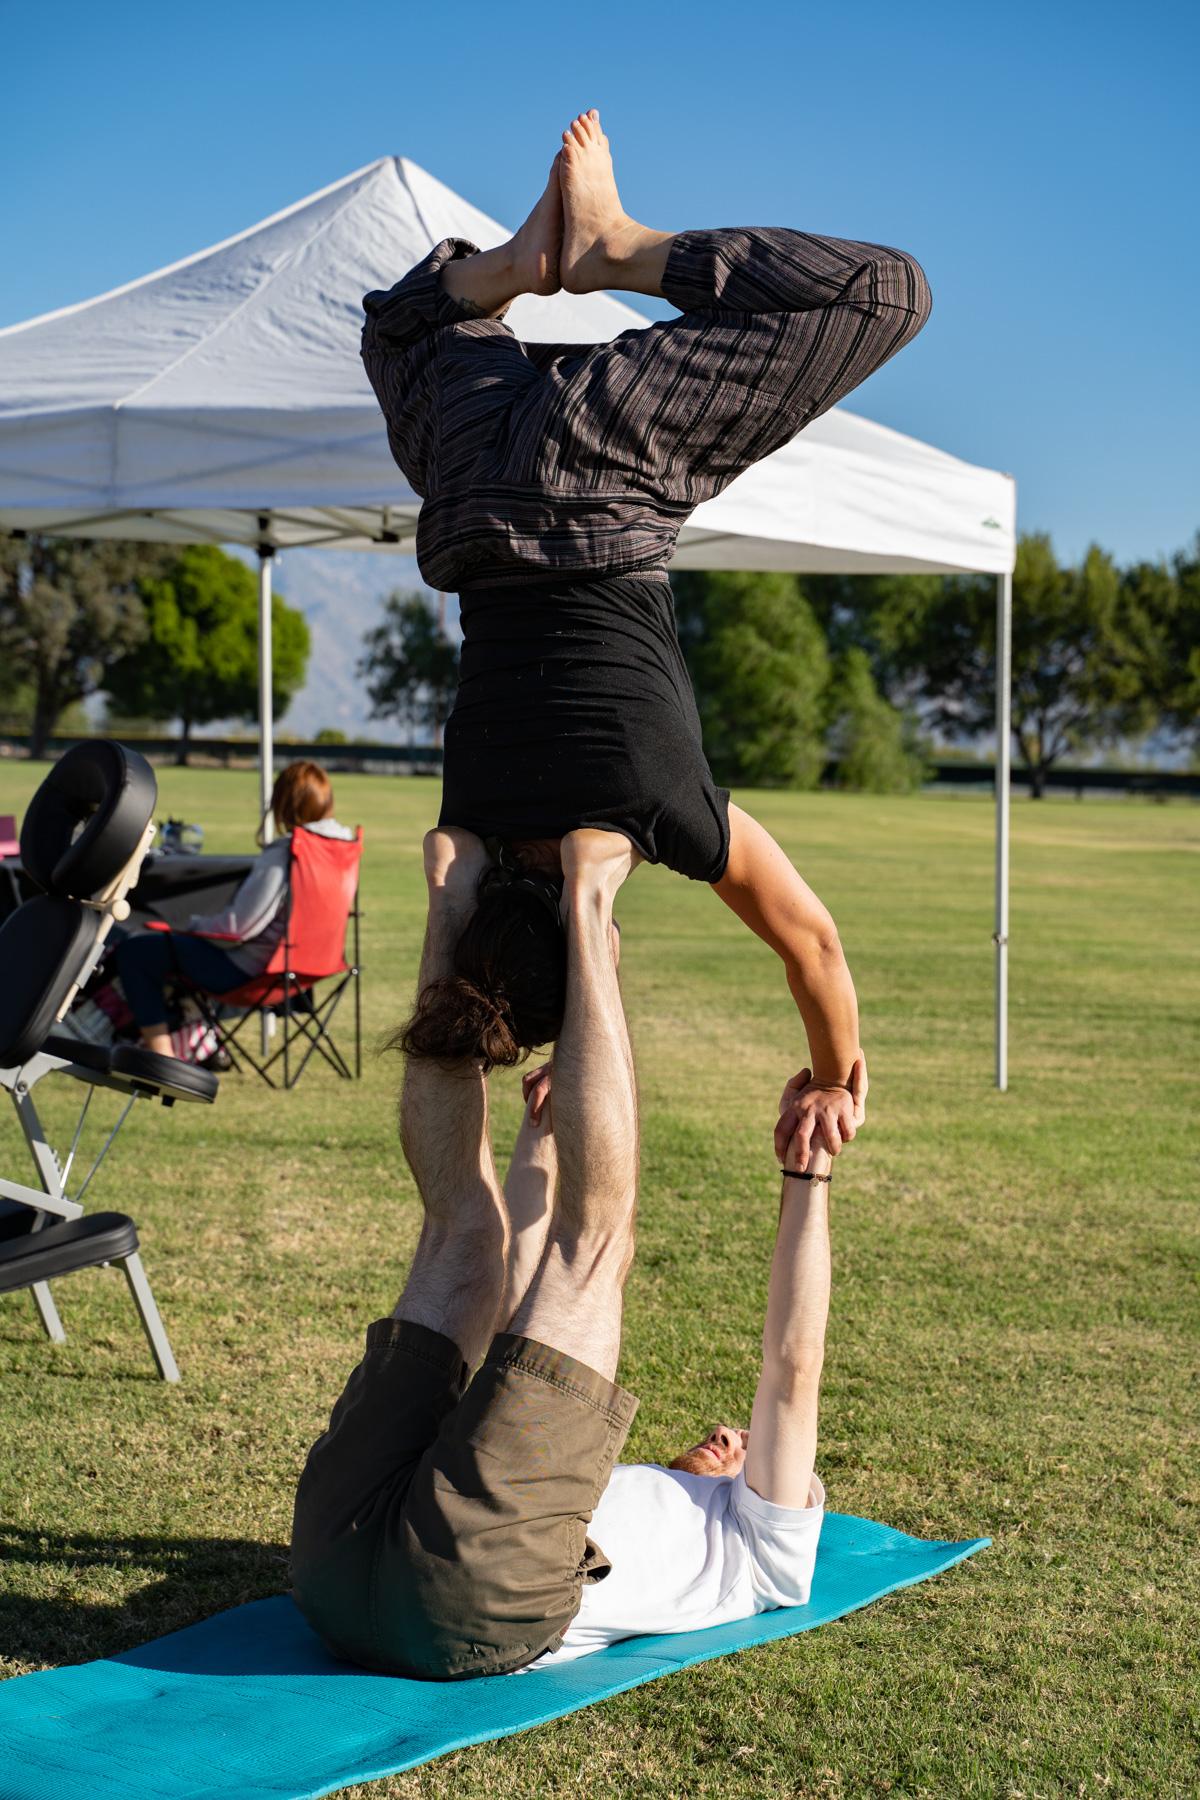 chernati-yoga-massage-10-12-19-05556